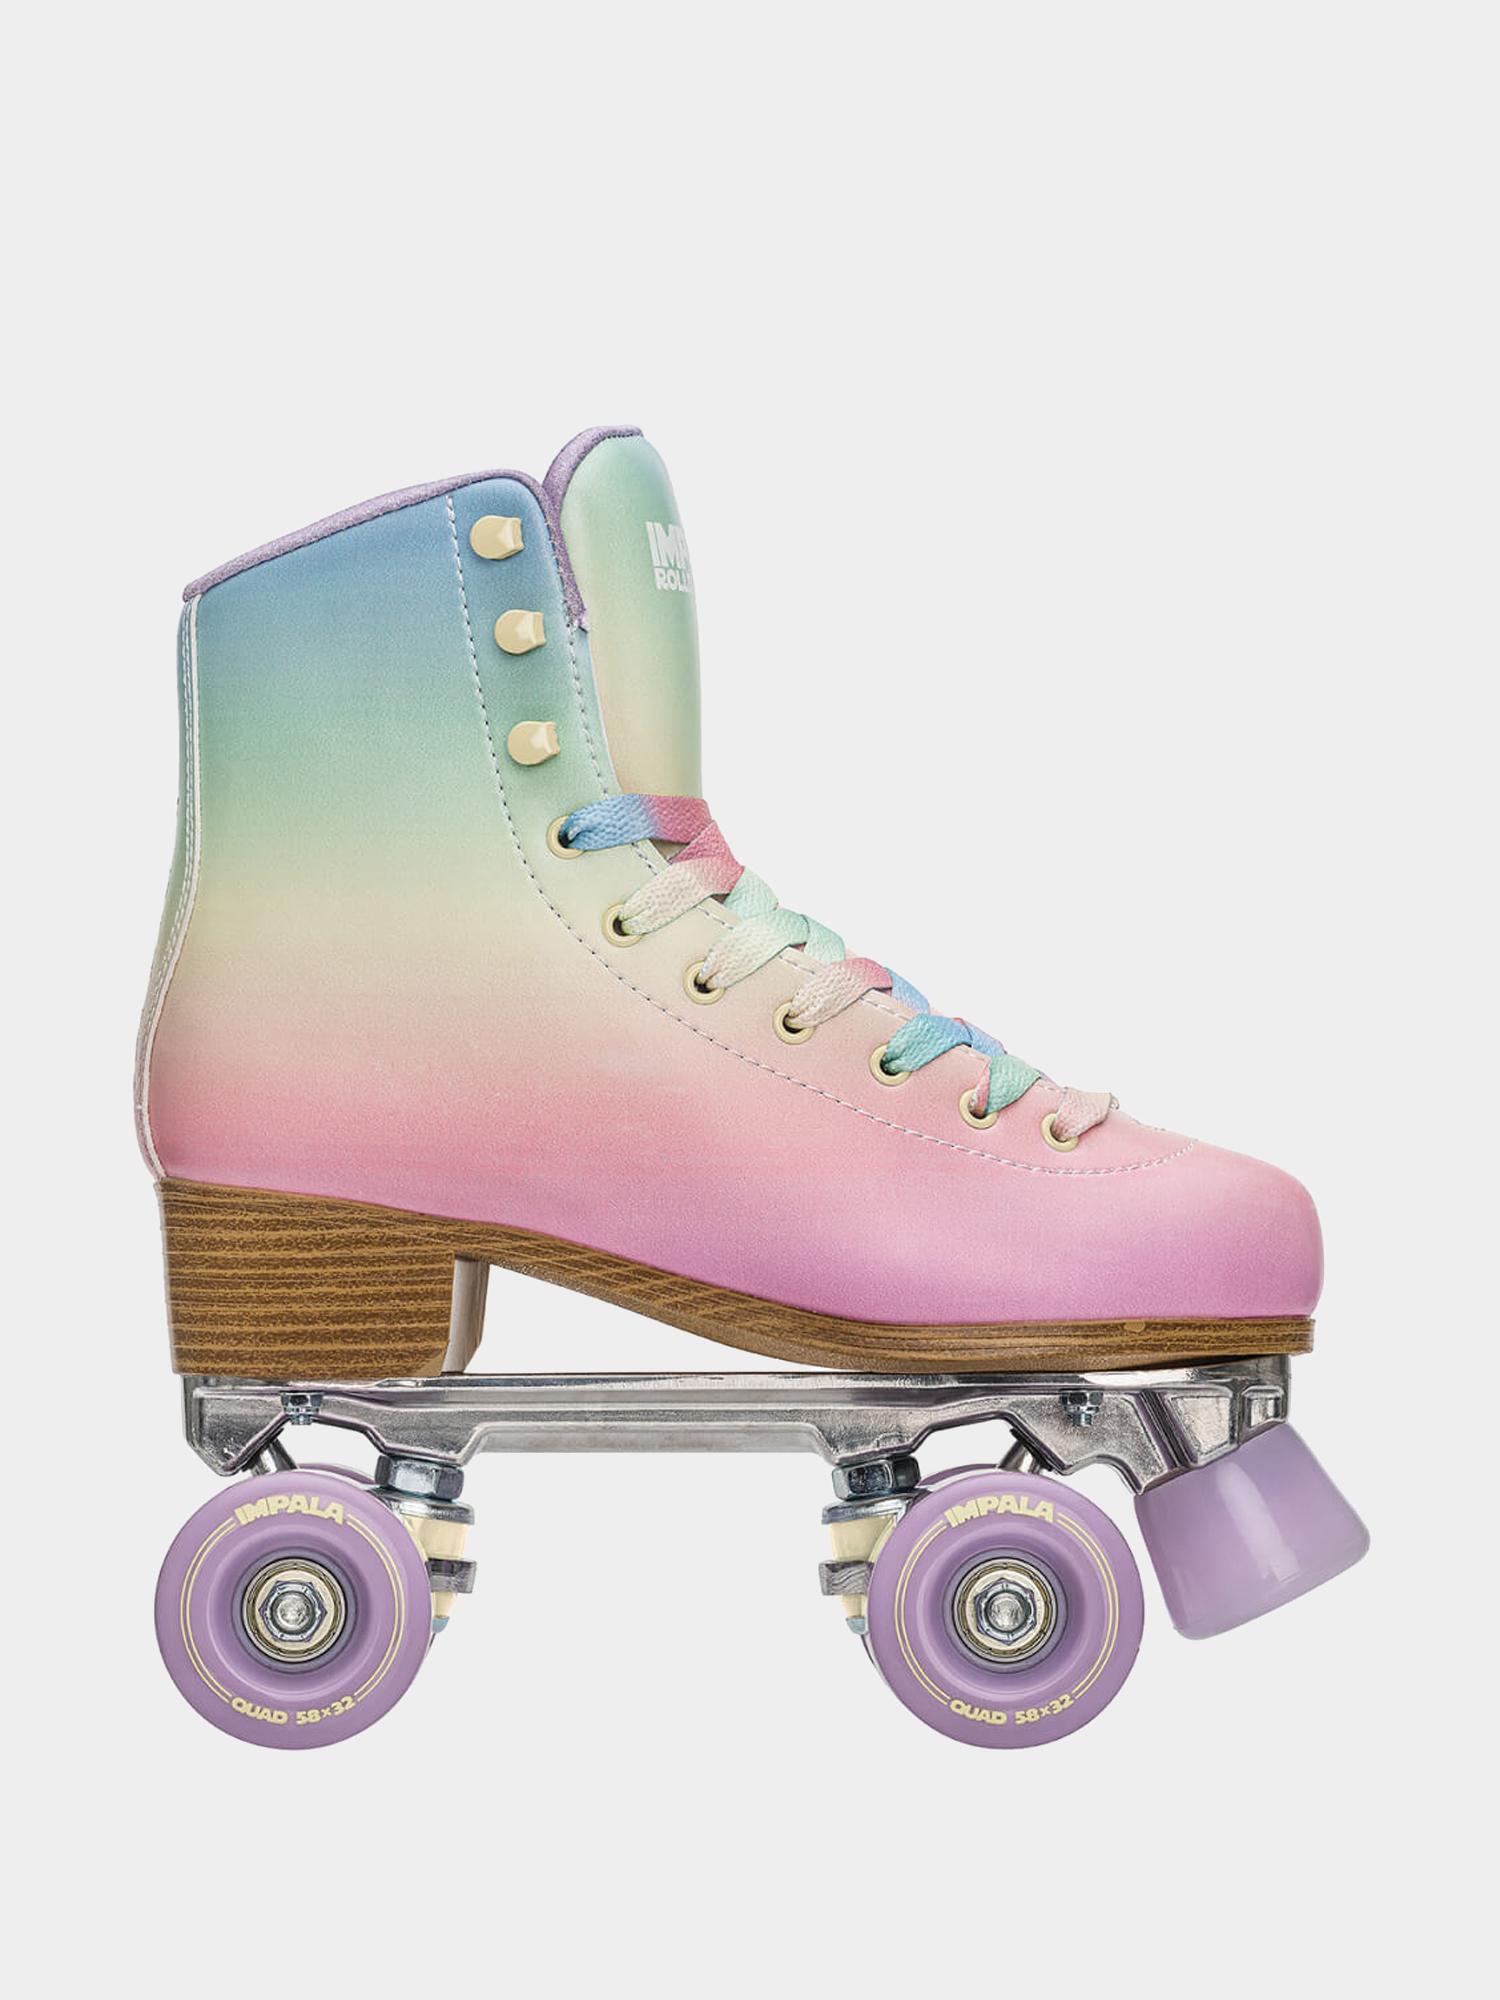 Wrotki Impala Quad Skate Wmn (pastel fade)